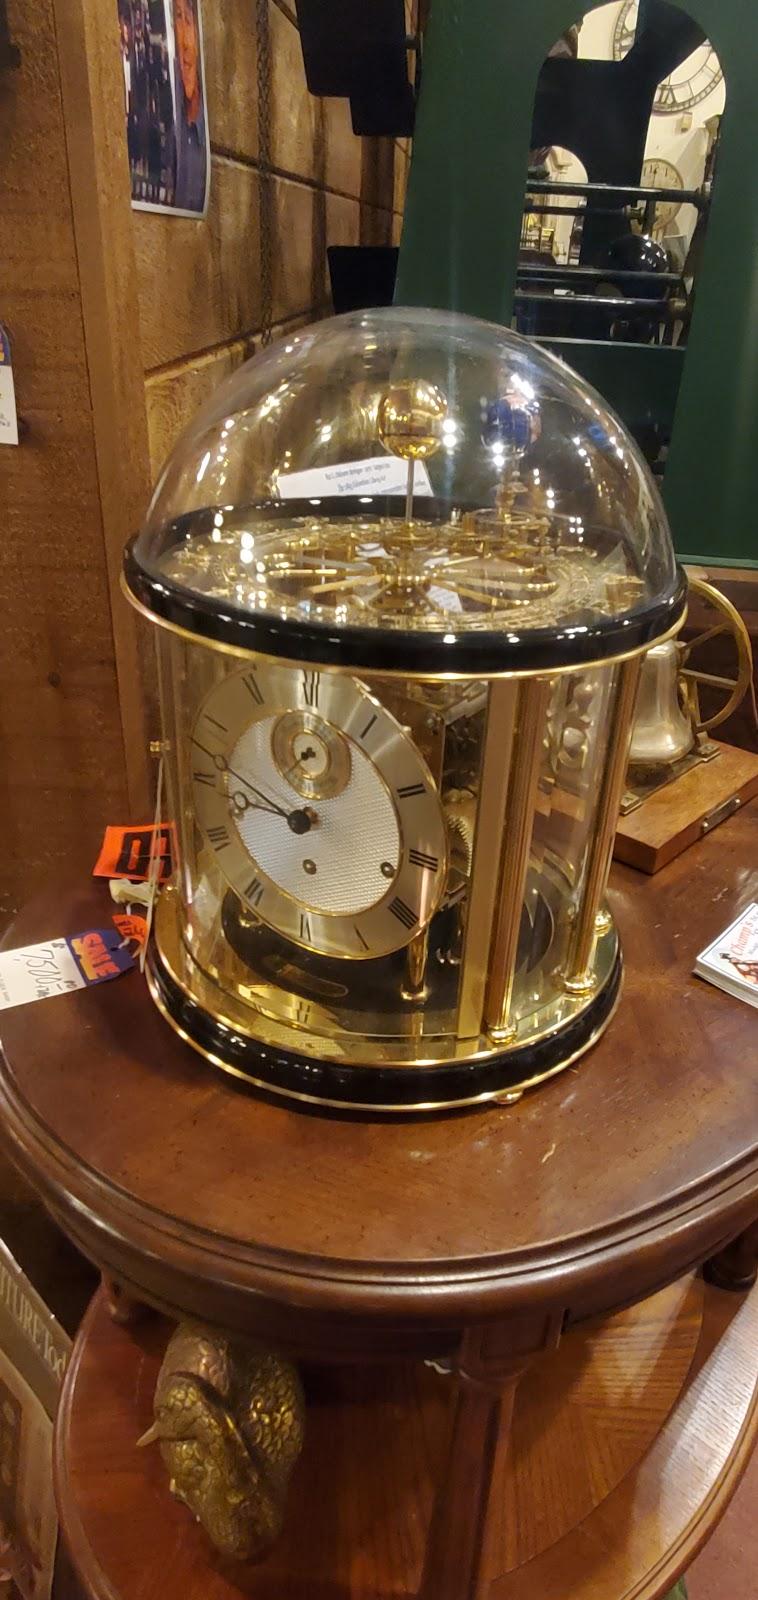 Champs Clock Shop - museum    Photo 5 of 10   Address: 3834 King Dr, Douglasville, GA 30135, USA   Phone: (770) 942-2128